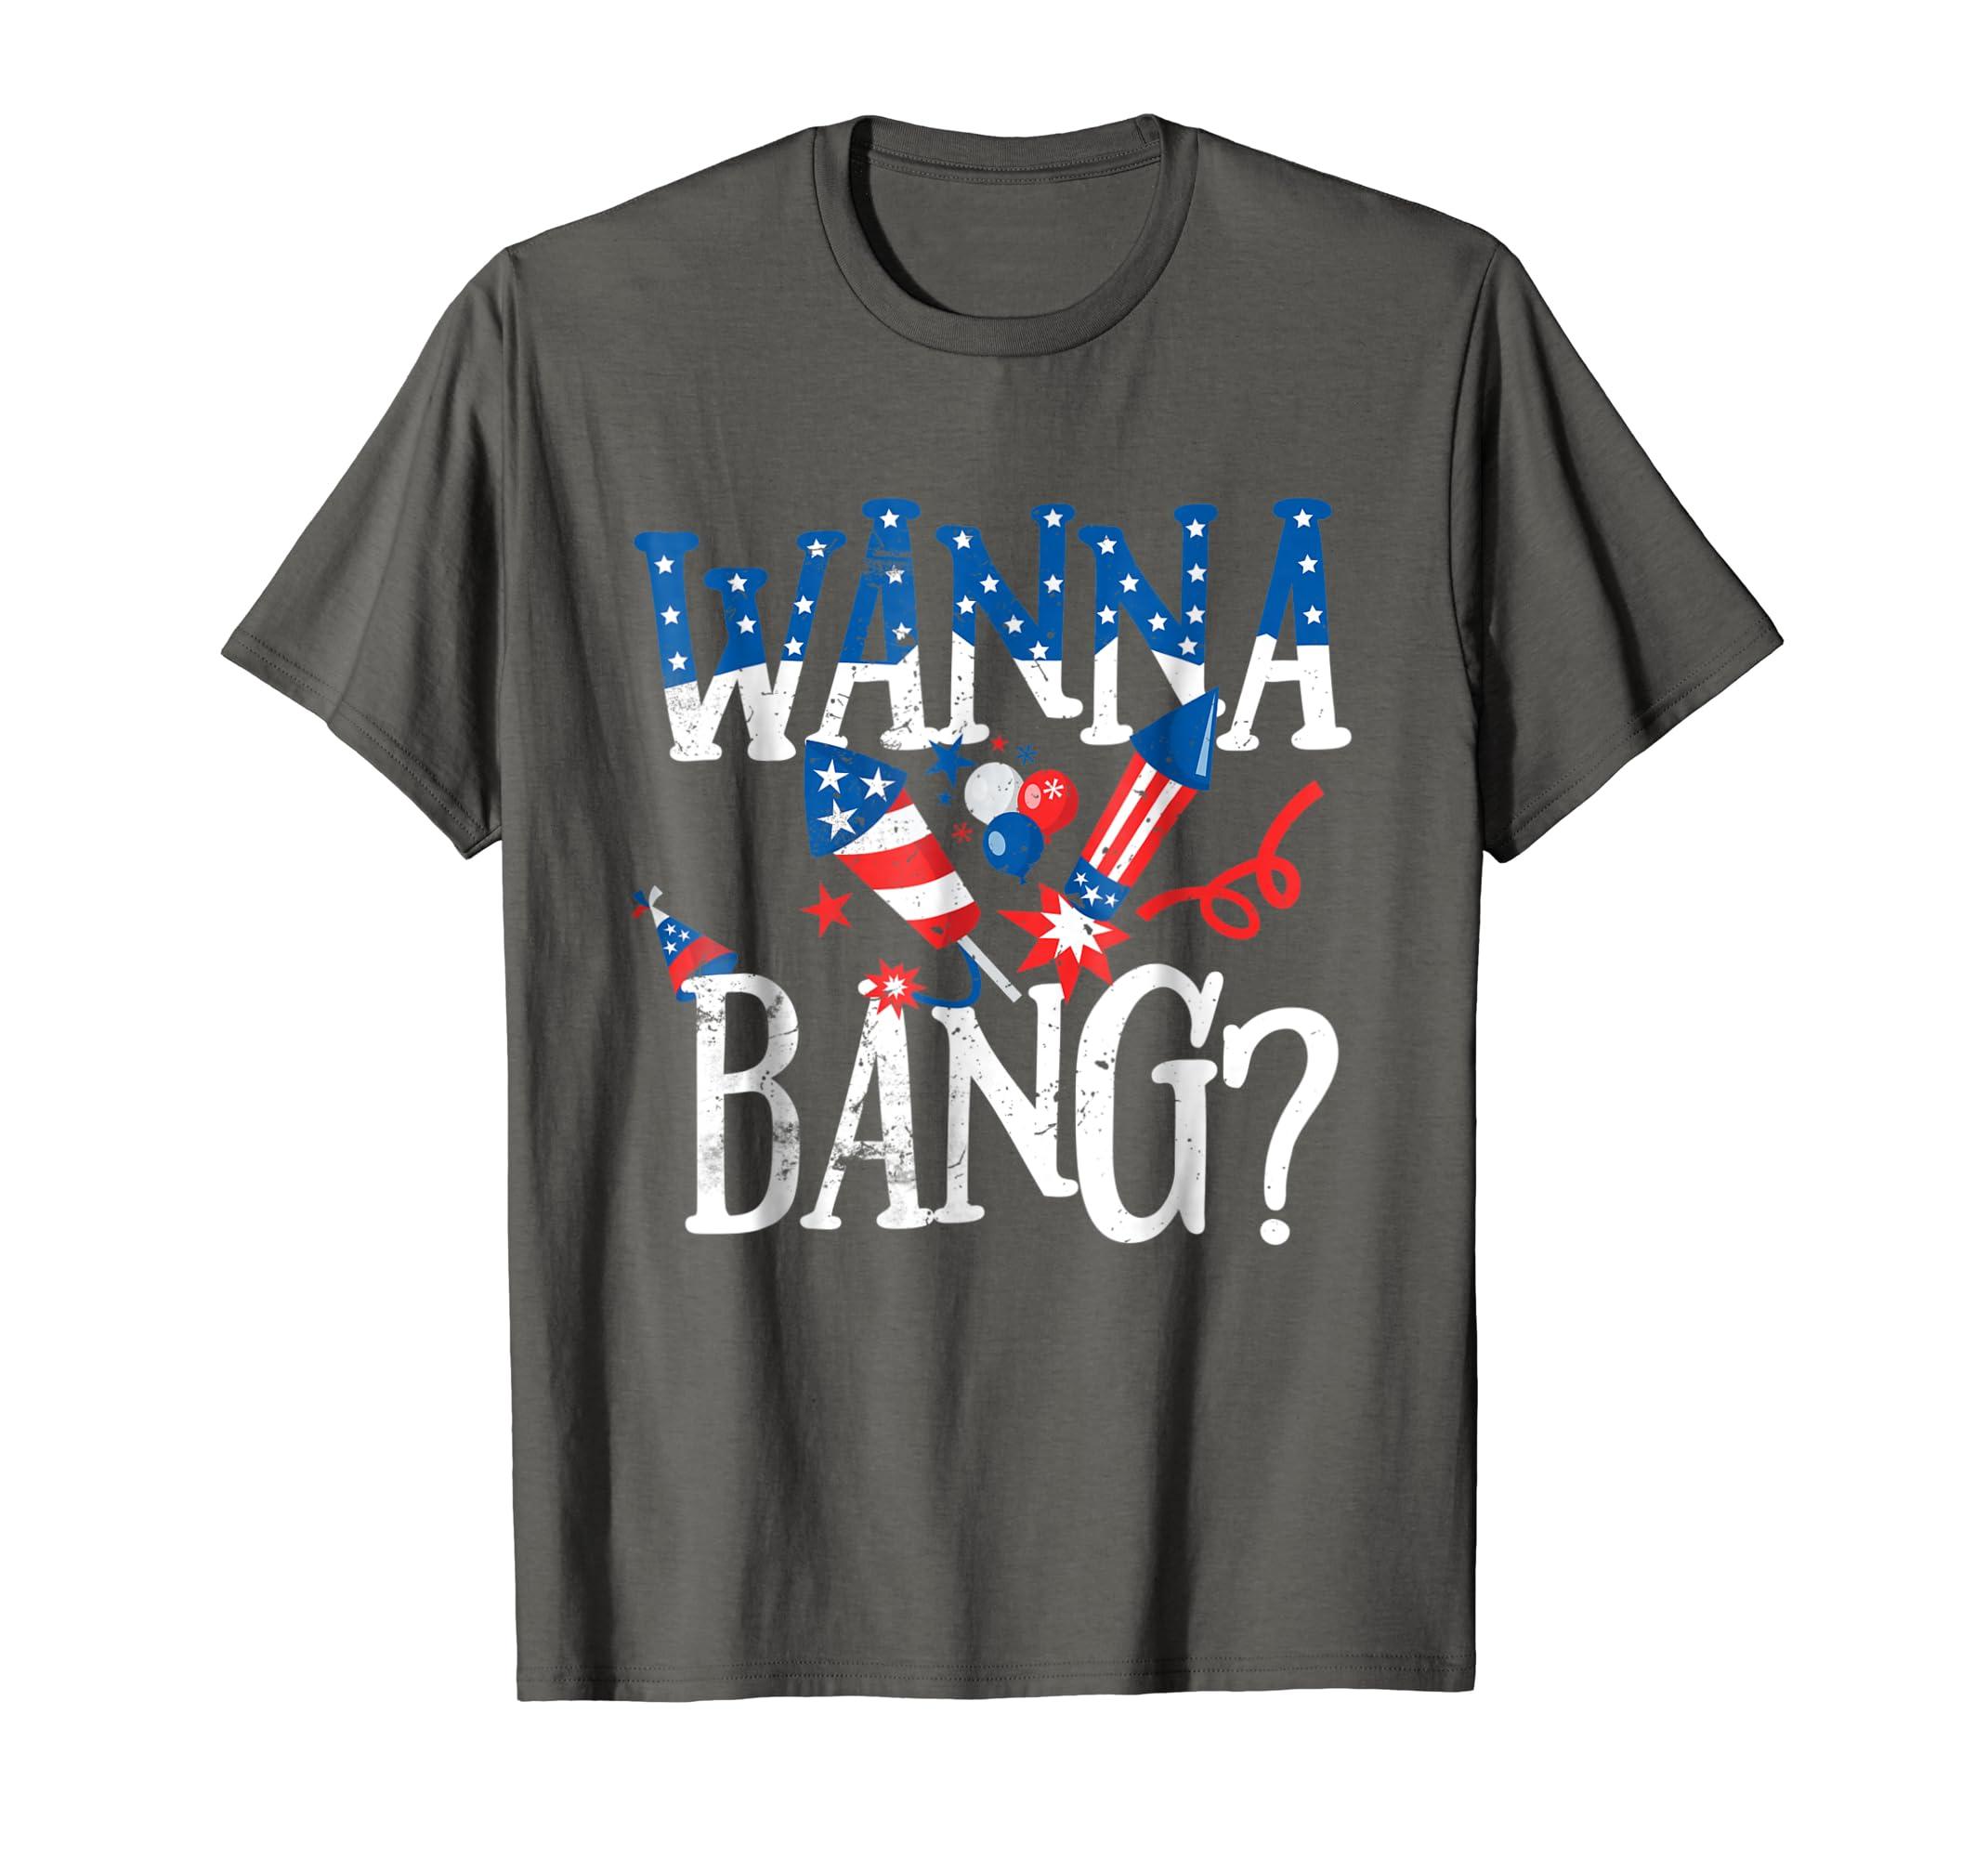 c43a72c88f8f2 Amazon.com: Wanna Bang Funny July 4th Gift T Shirt: Clothing